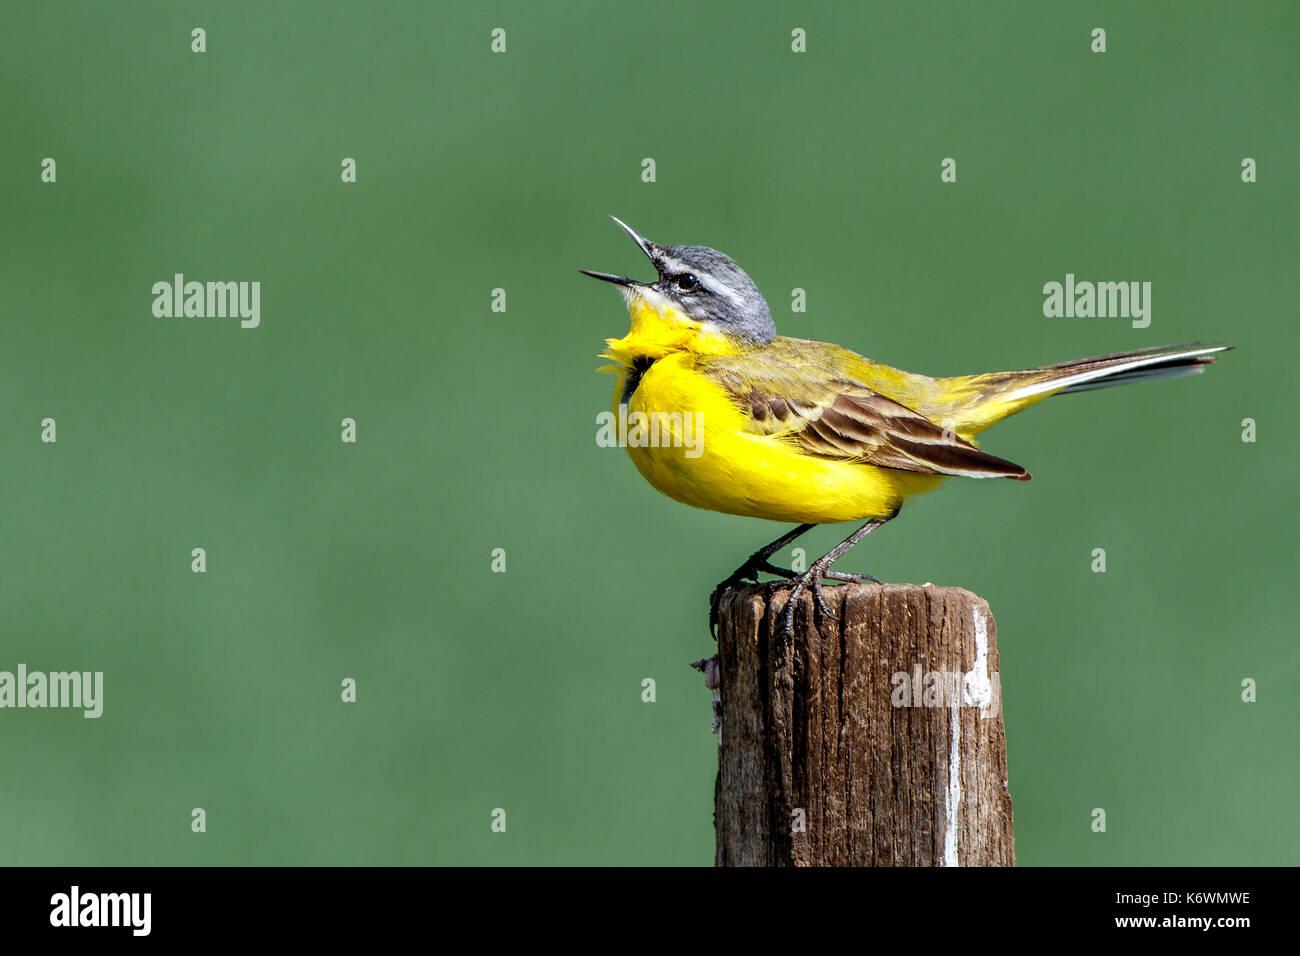 Yellow wagtail (Motacilla flava), singing on fence post, Burgenland, Austria - Stock Image